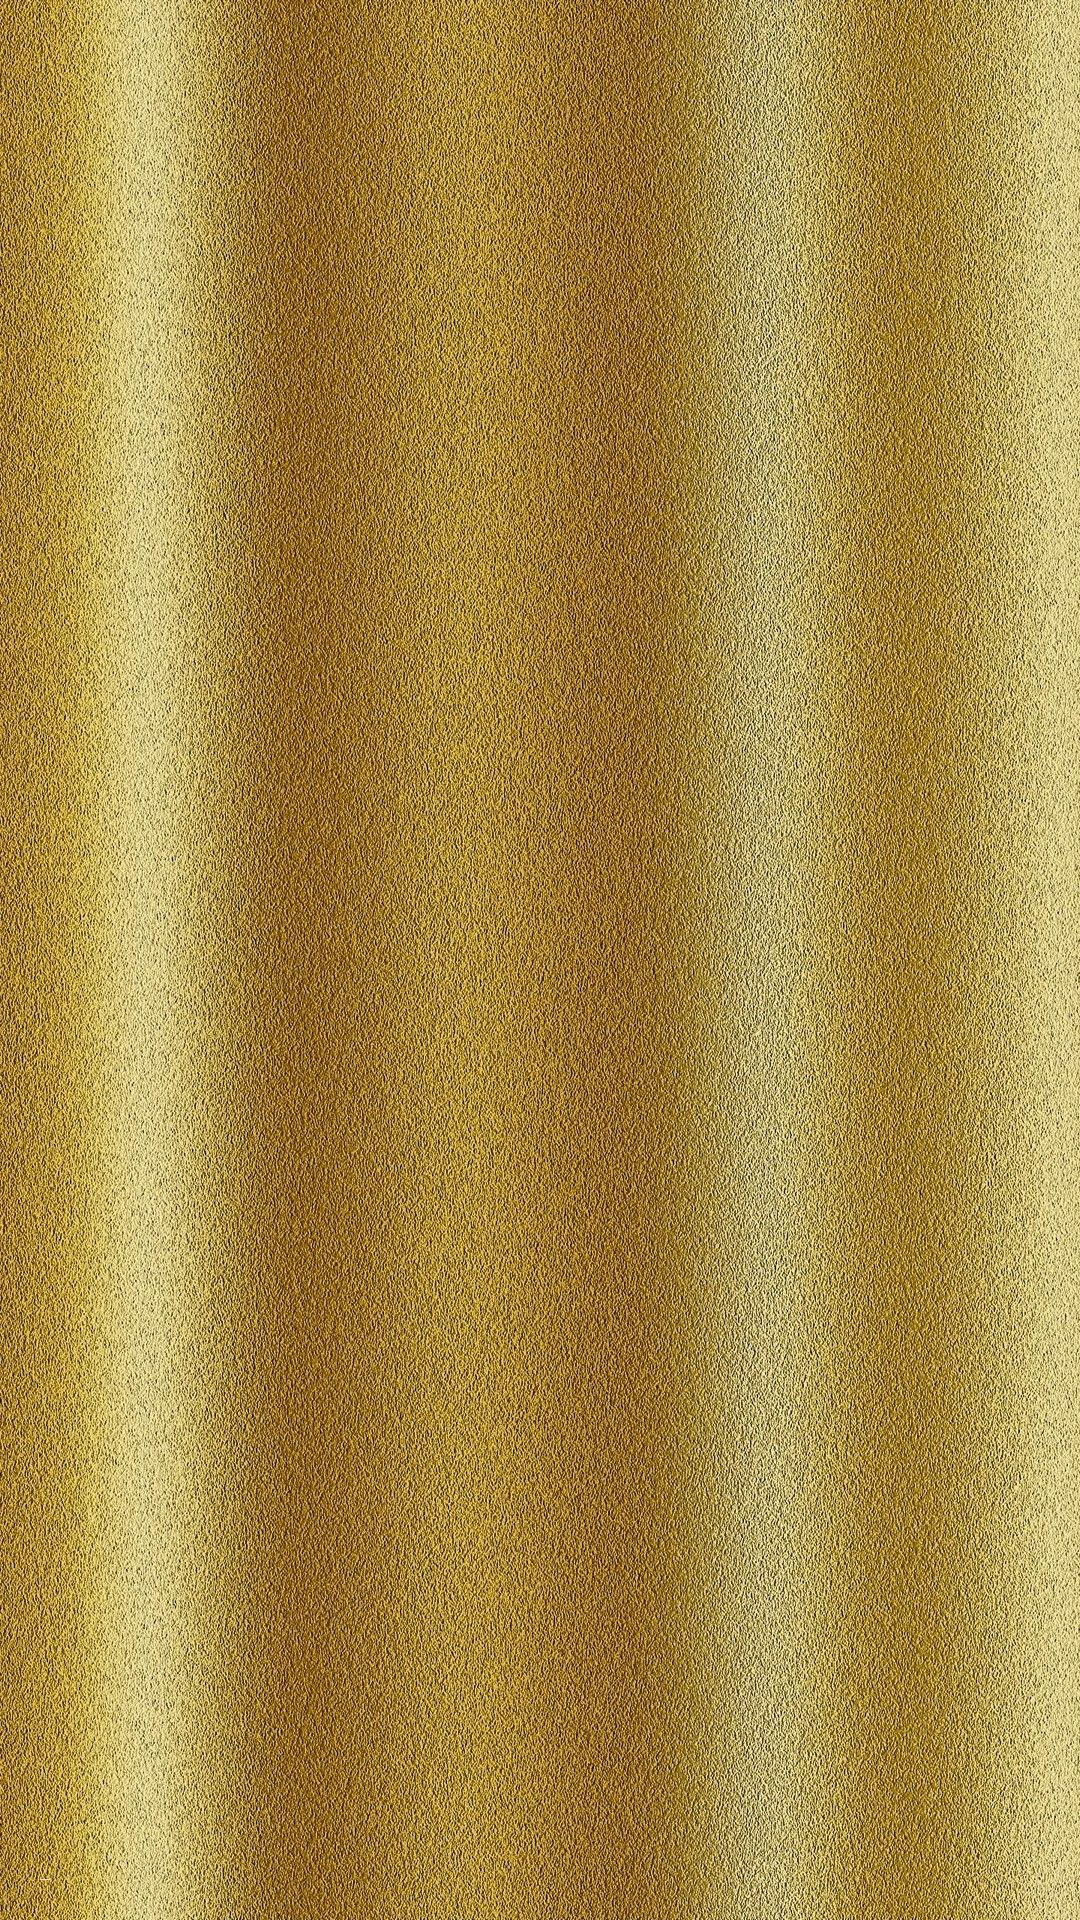 Res: 1080x1920, Wandfarbe Bronze Metallic Schön Metallic Gold android Wallpaper